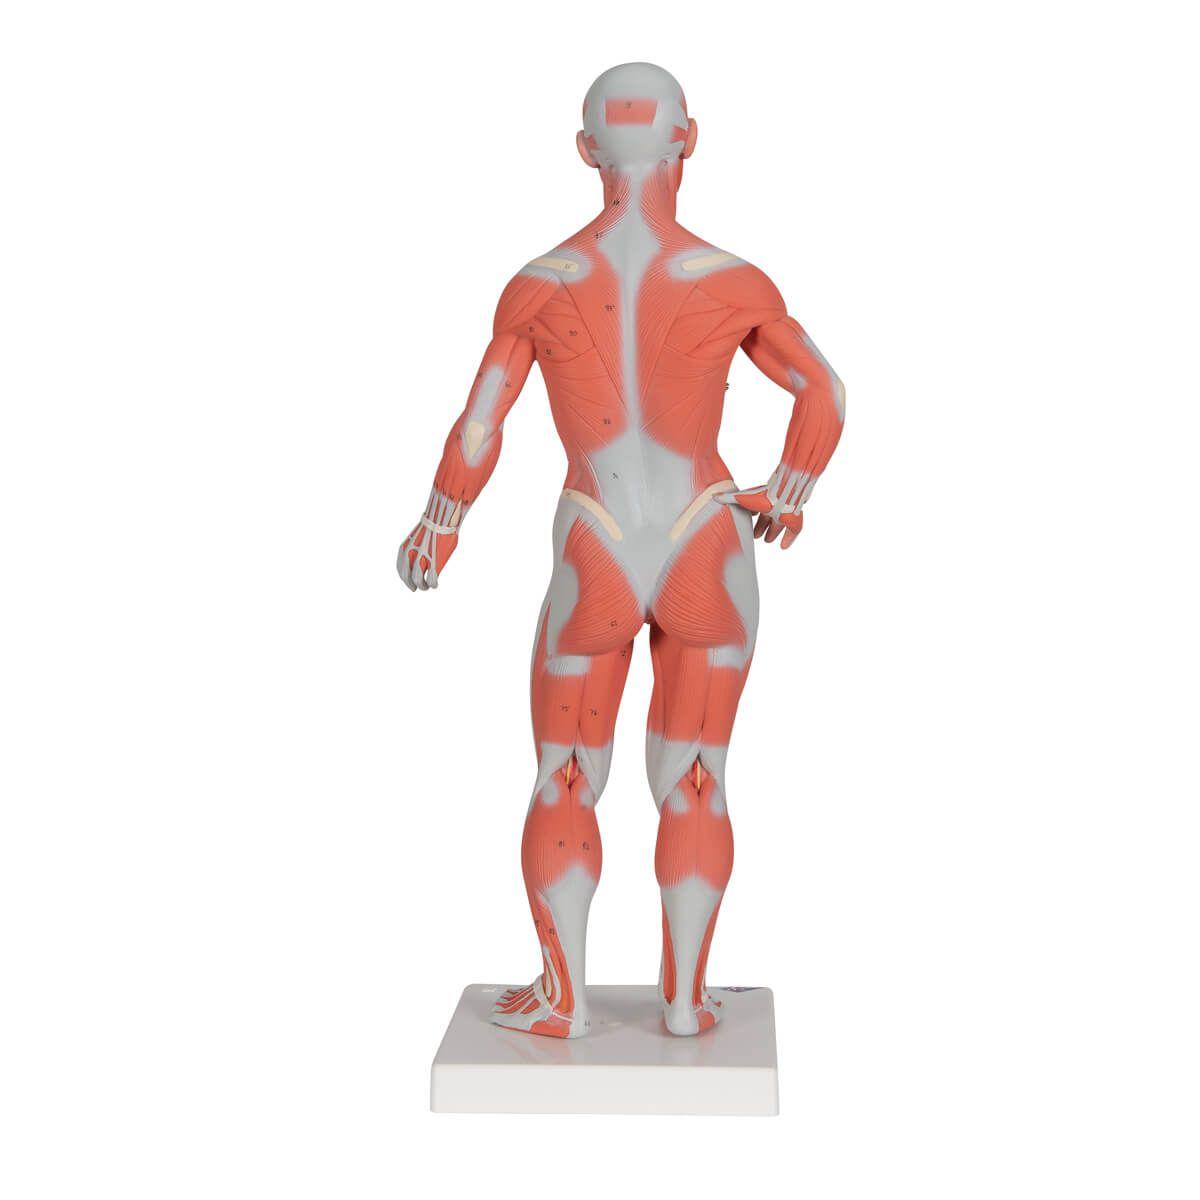 Figura Muscular Masculina, 1/3 do Tamanho Natural